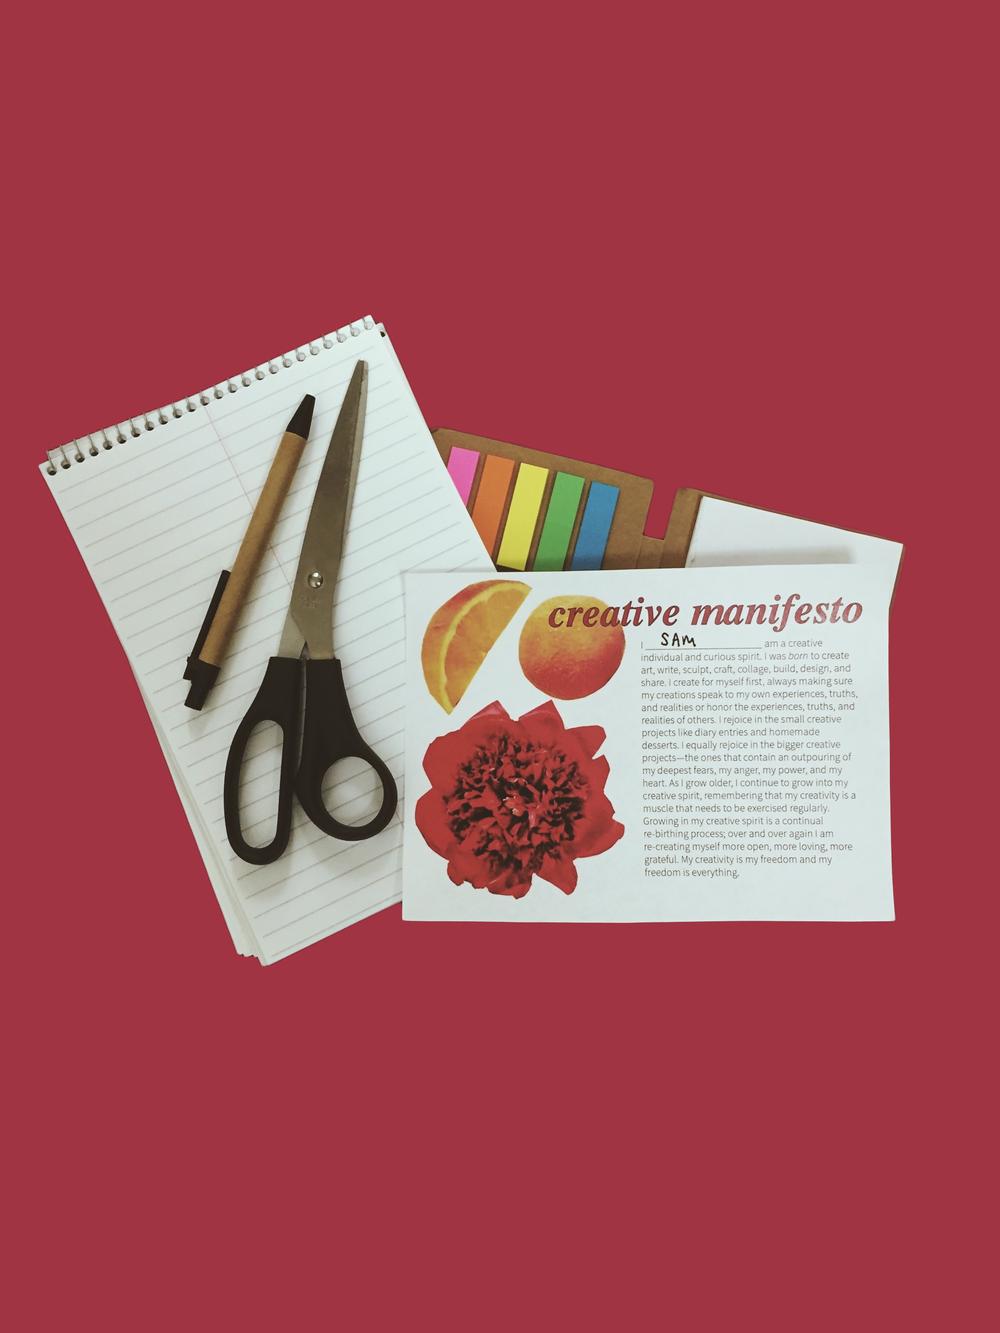 Creative Manifesto_Flat Lay.png